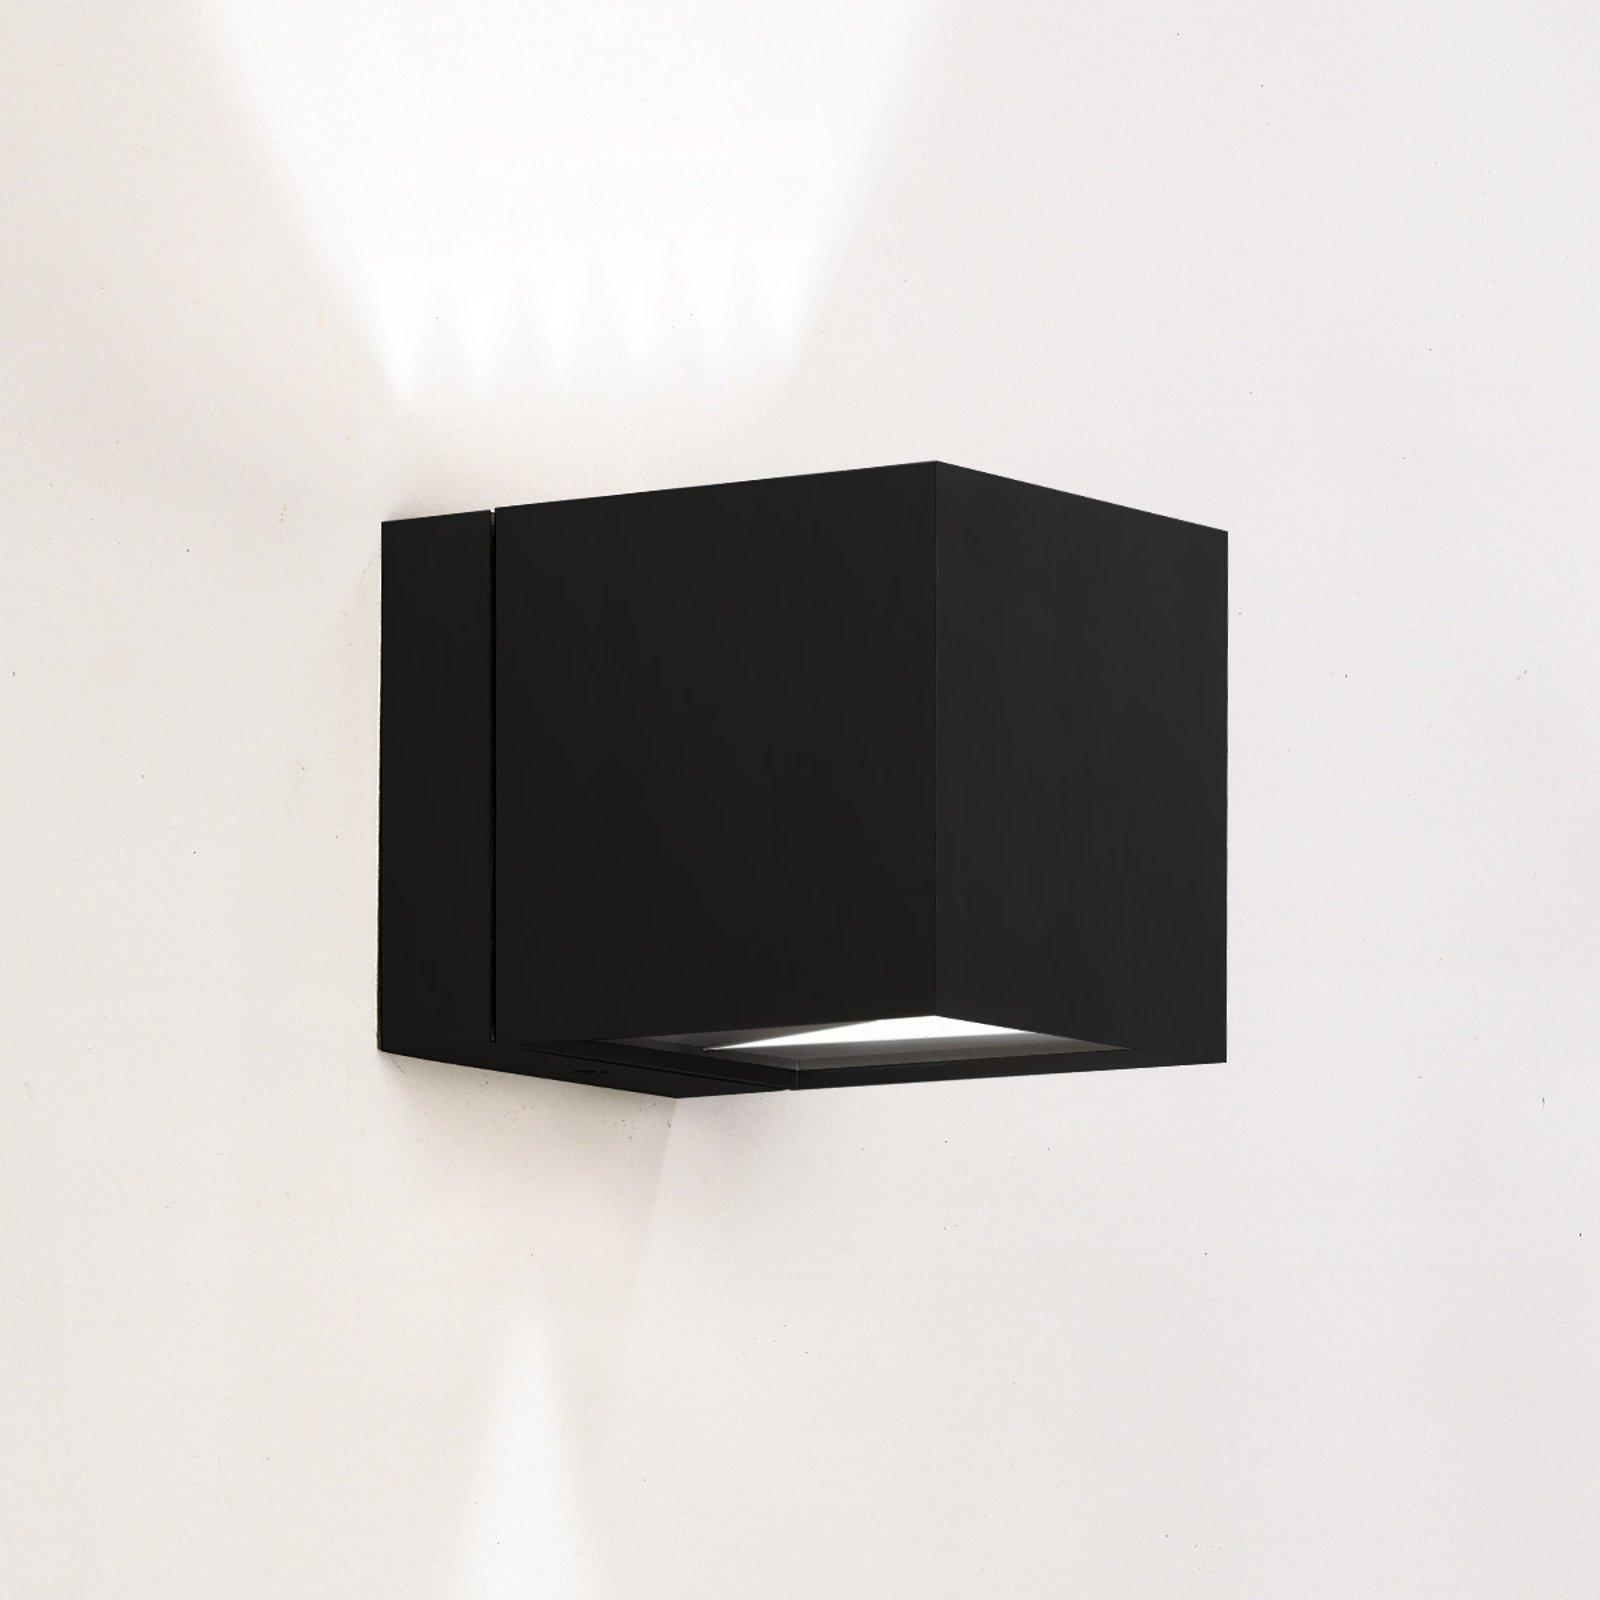 Vegglampe Dau med terningform up- downlight svart